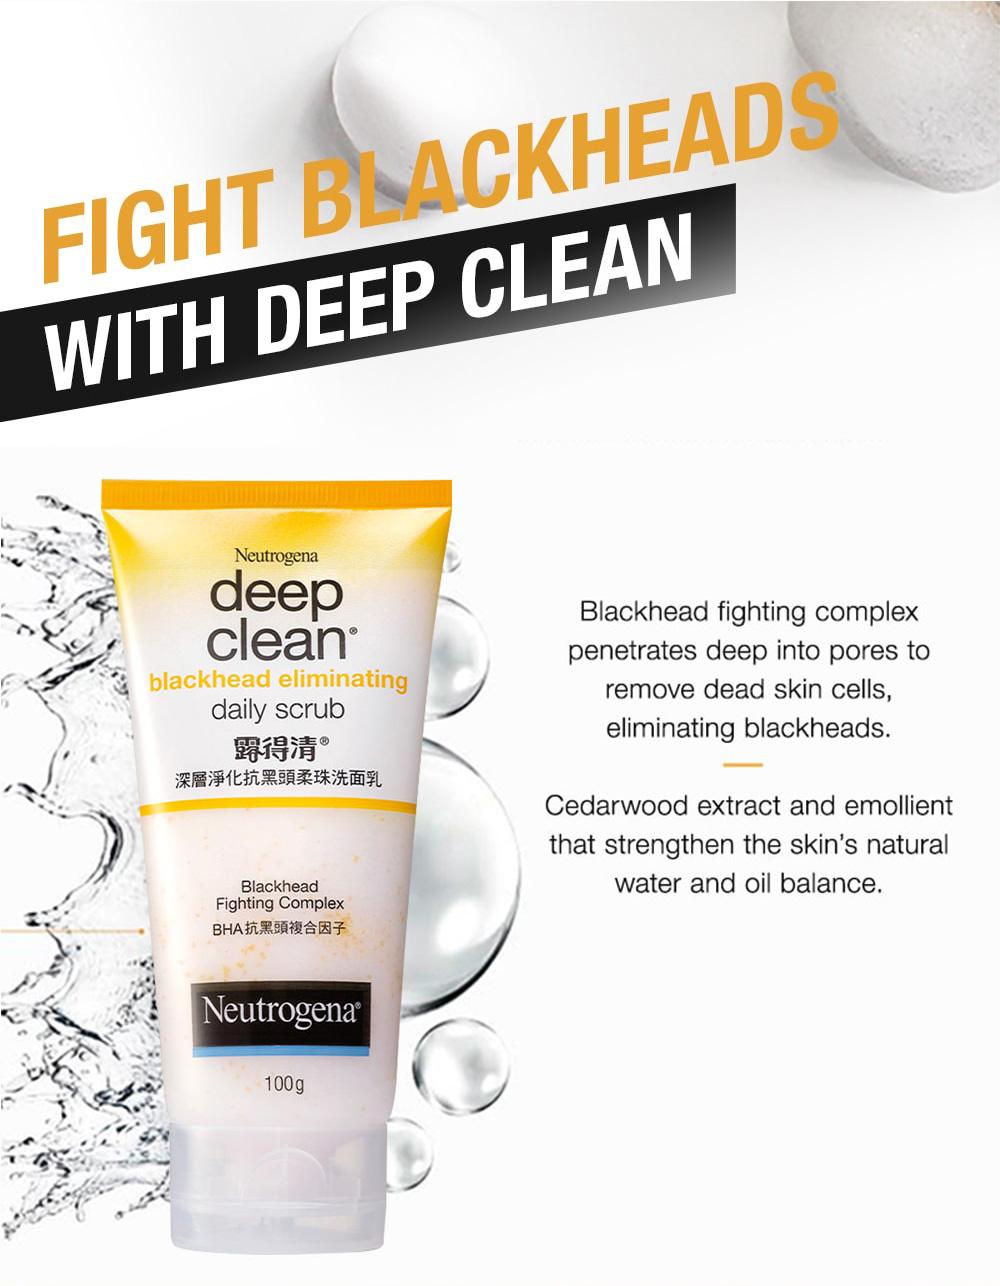 Blackhead Eliminating Daily Scrub - Benefits